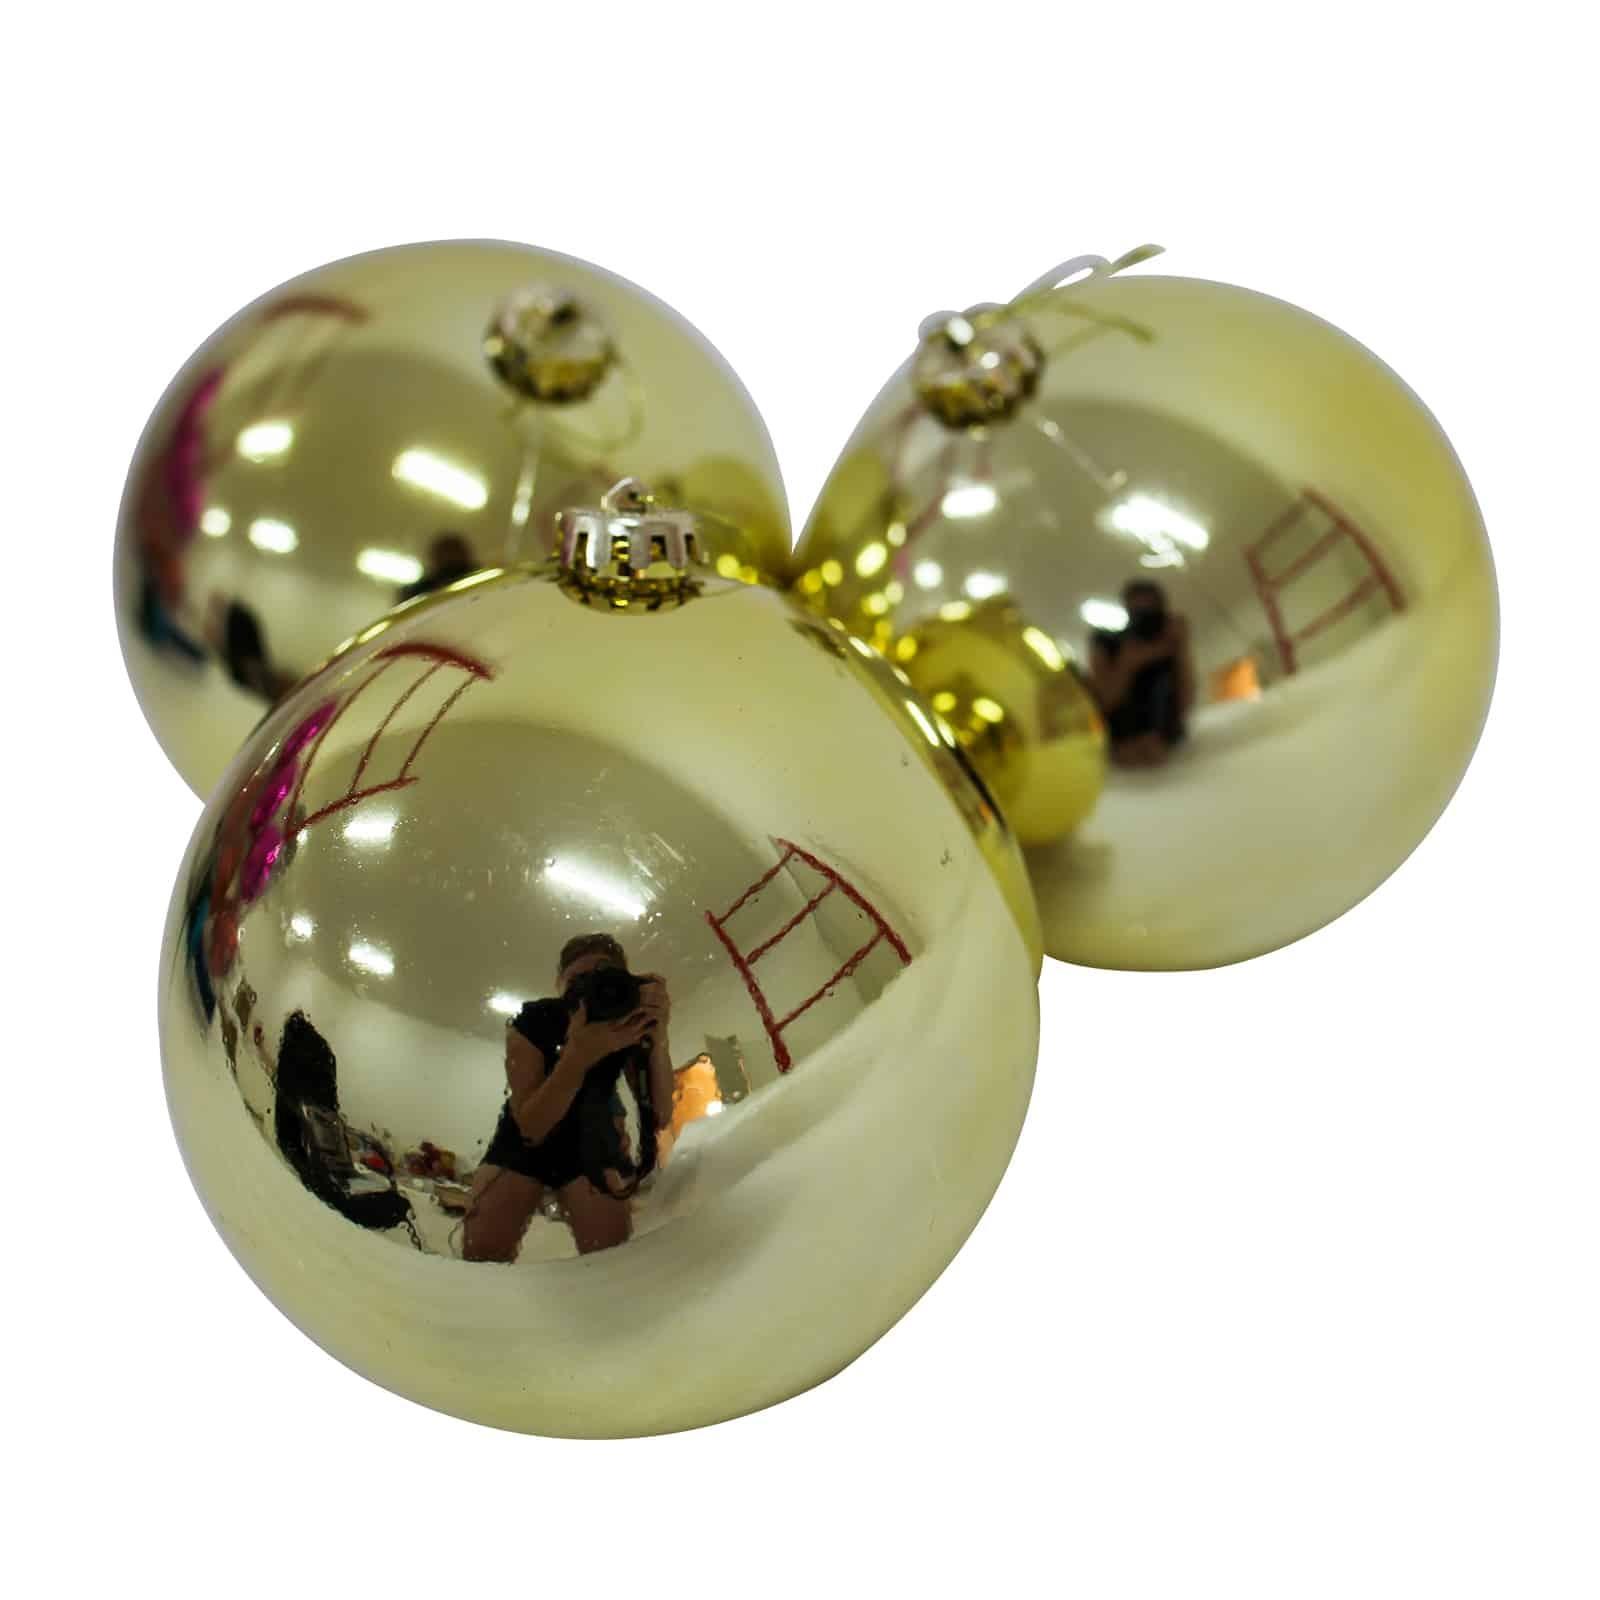 Christmas Baubles.150mm Christmas Baubles Gold 3 Balls Gloss Amazing Christmas